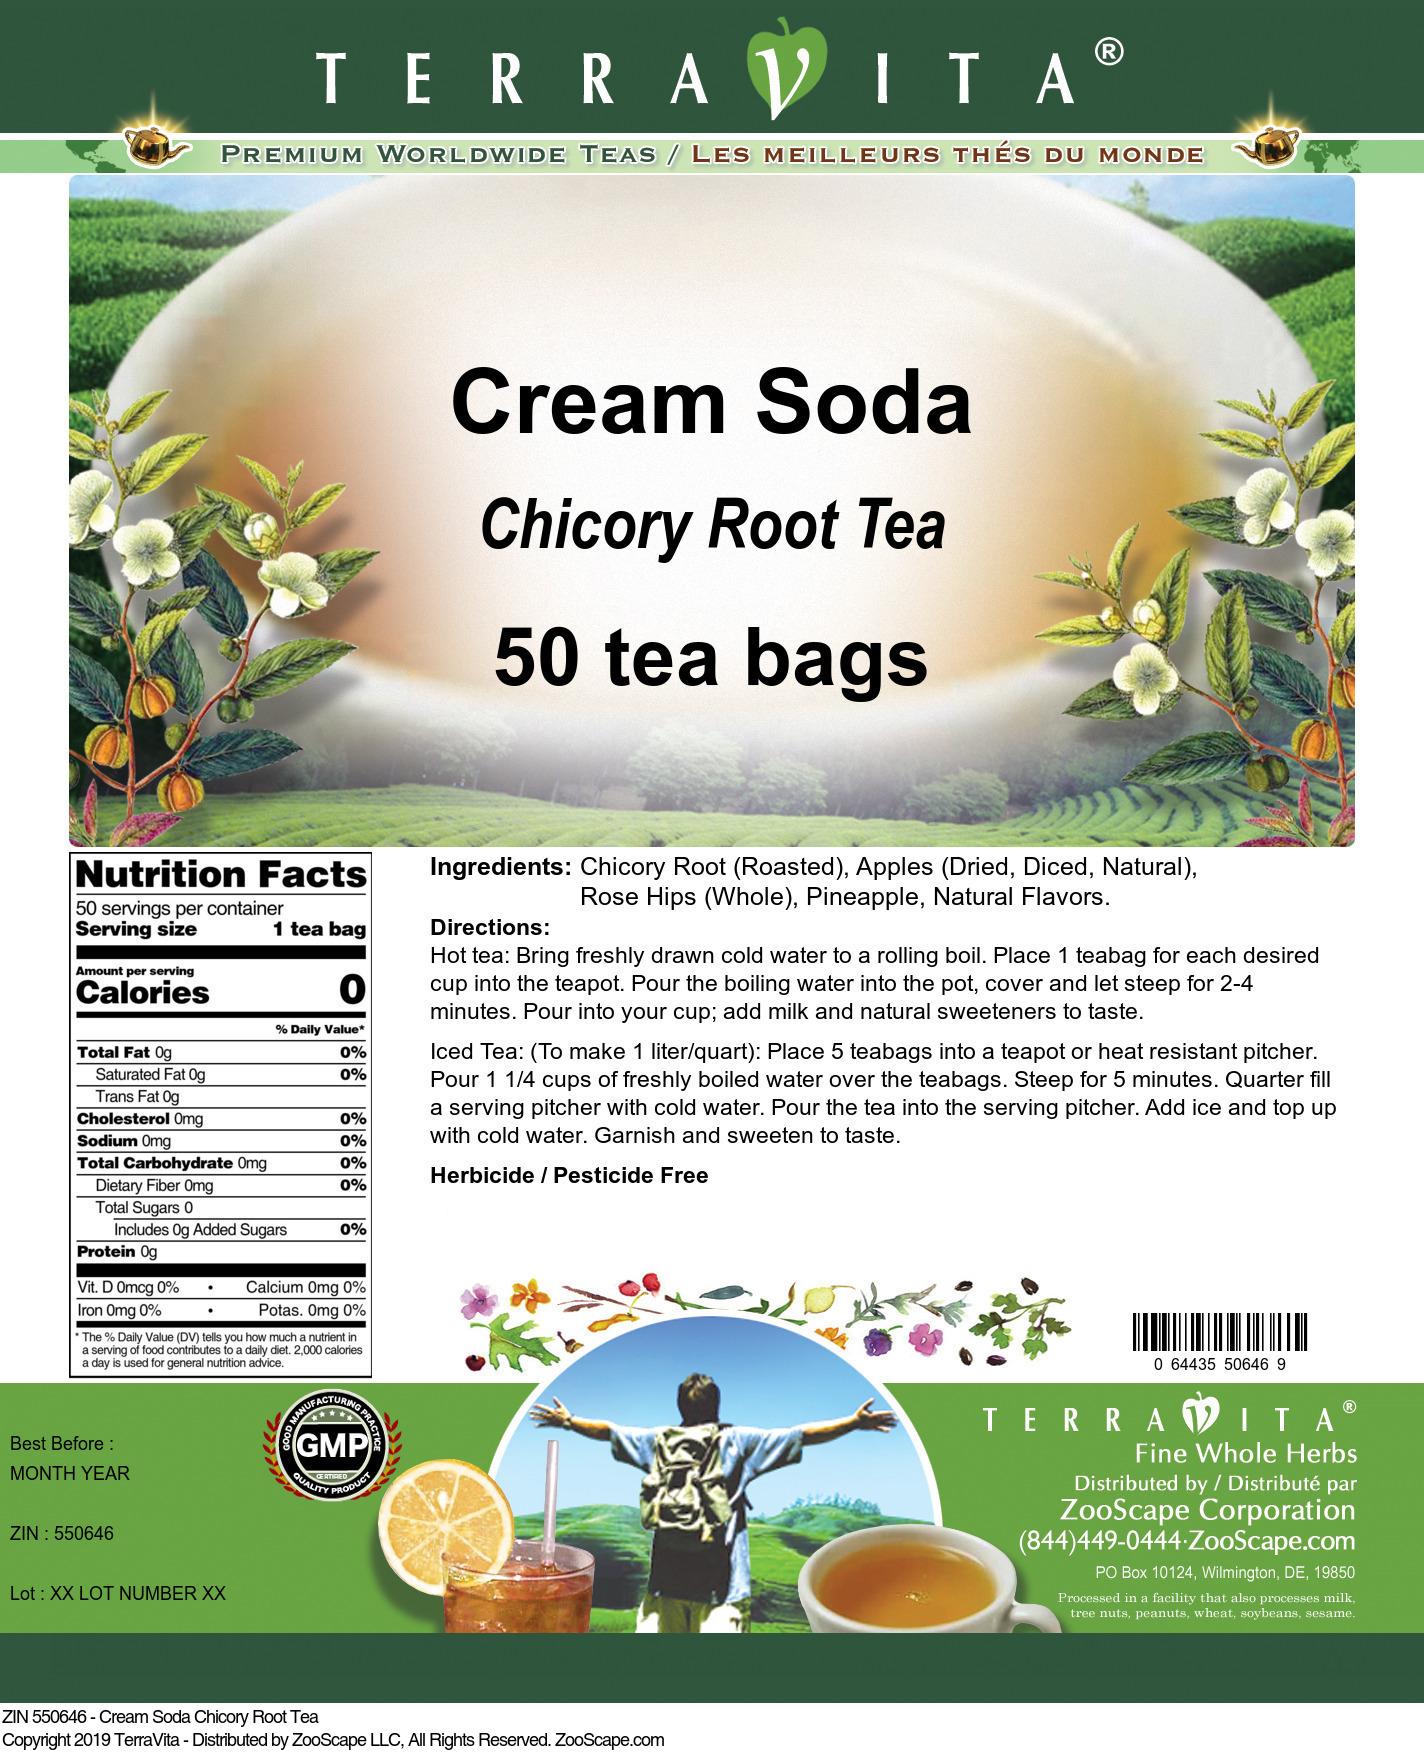 Cream Soda Chicory Root Tea